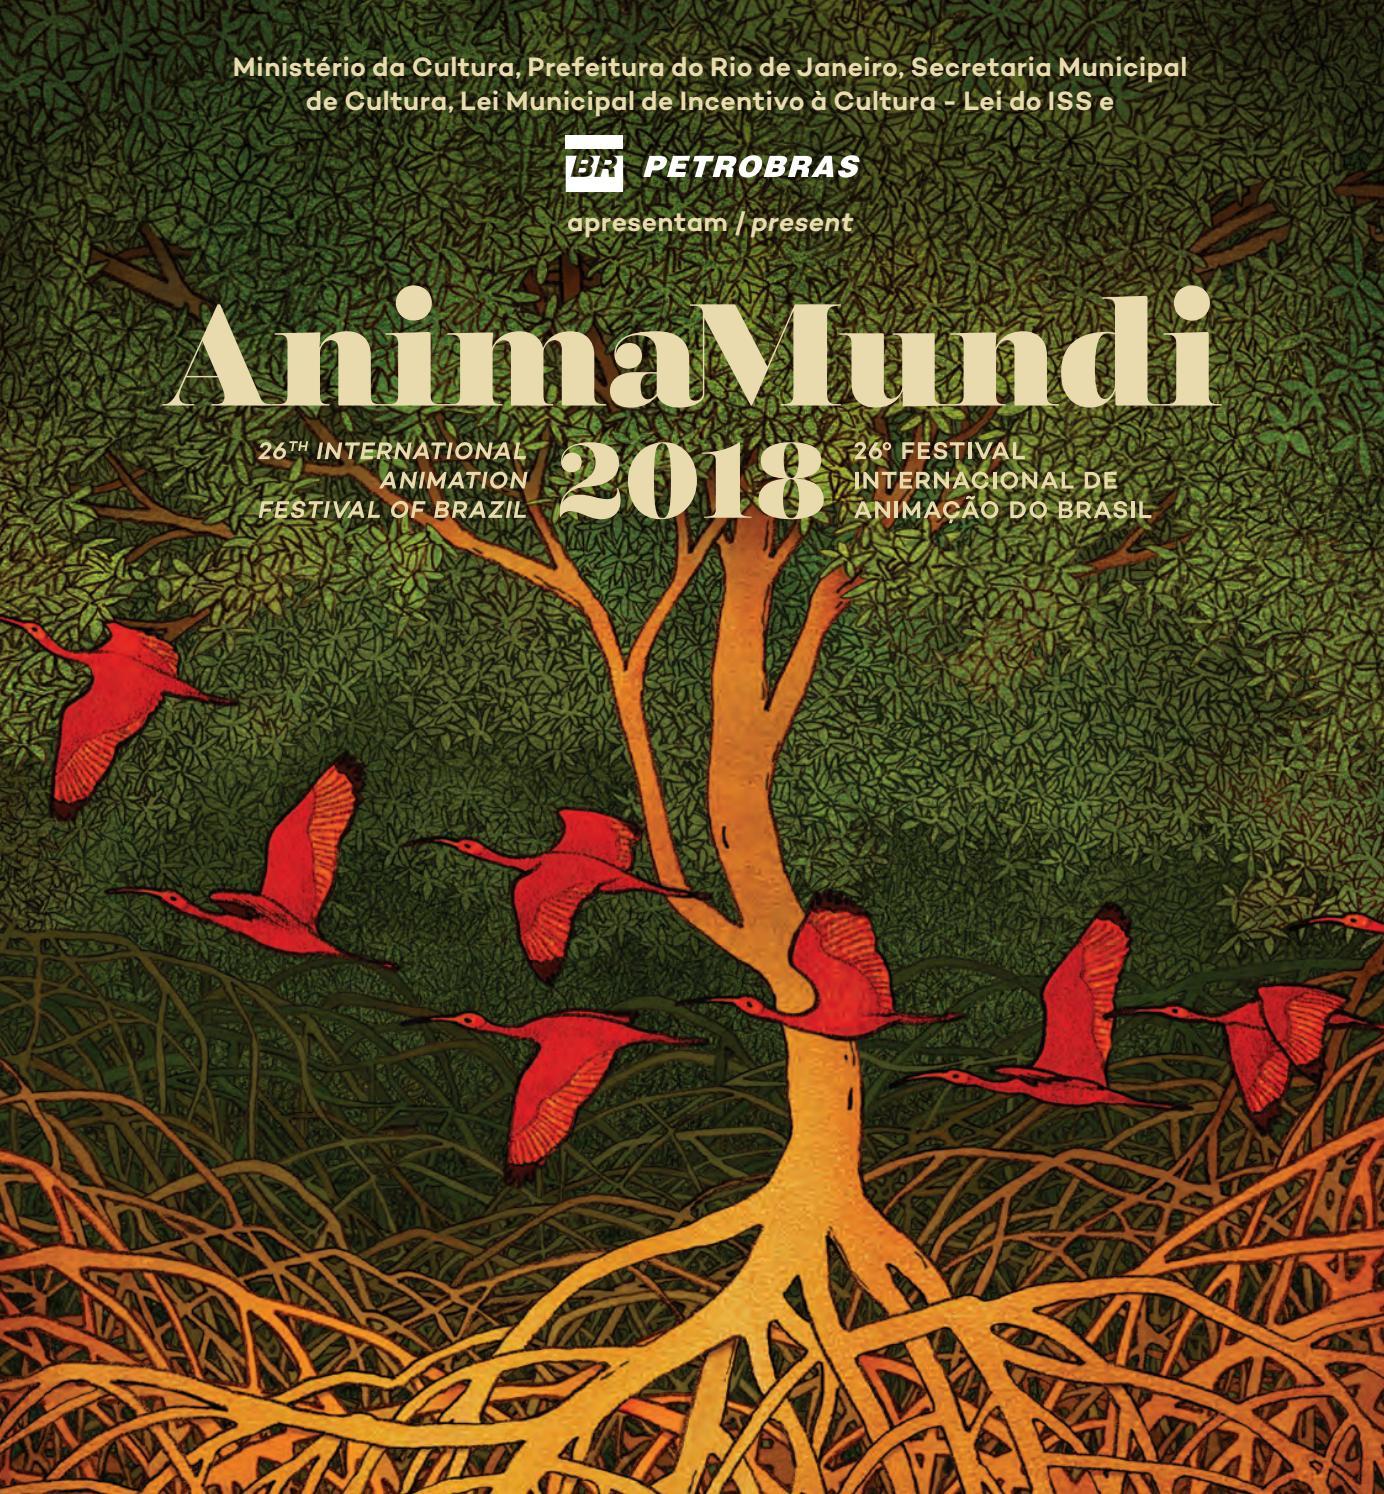 ddd2f42a7 Catálogo anima mundi 2018 by Anima Mundi - issuu